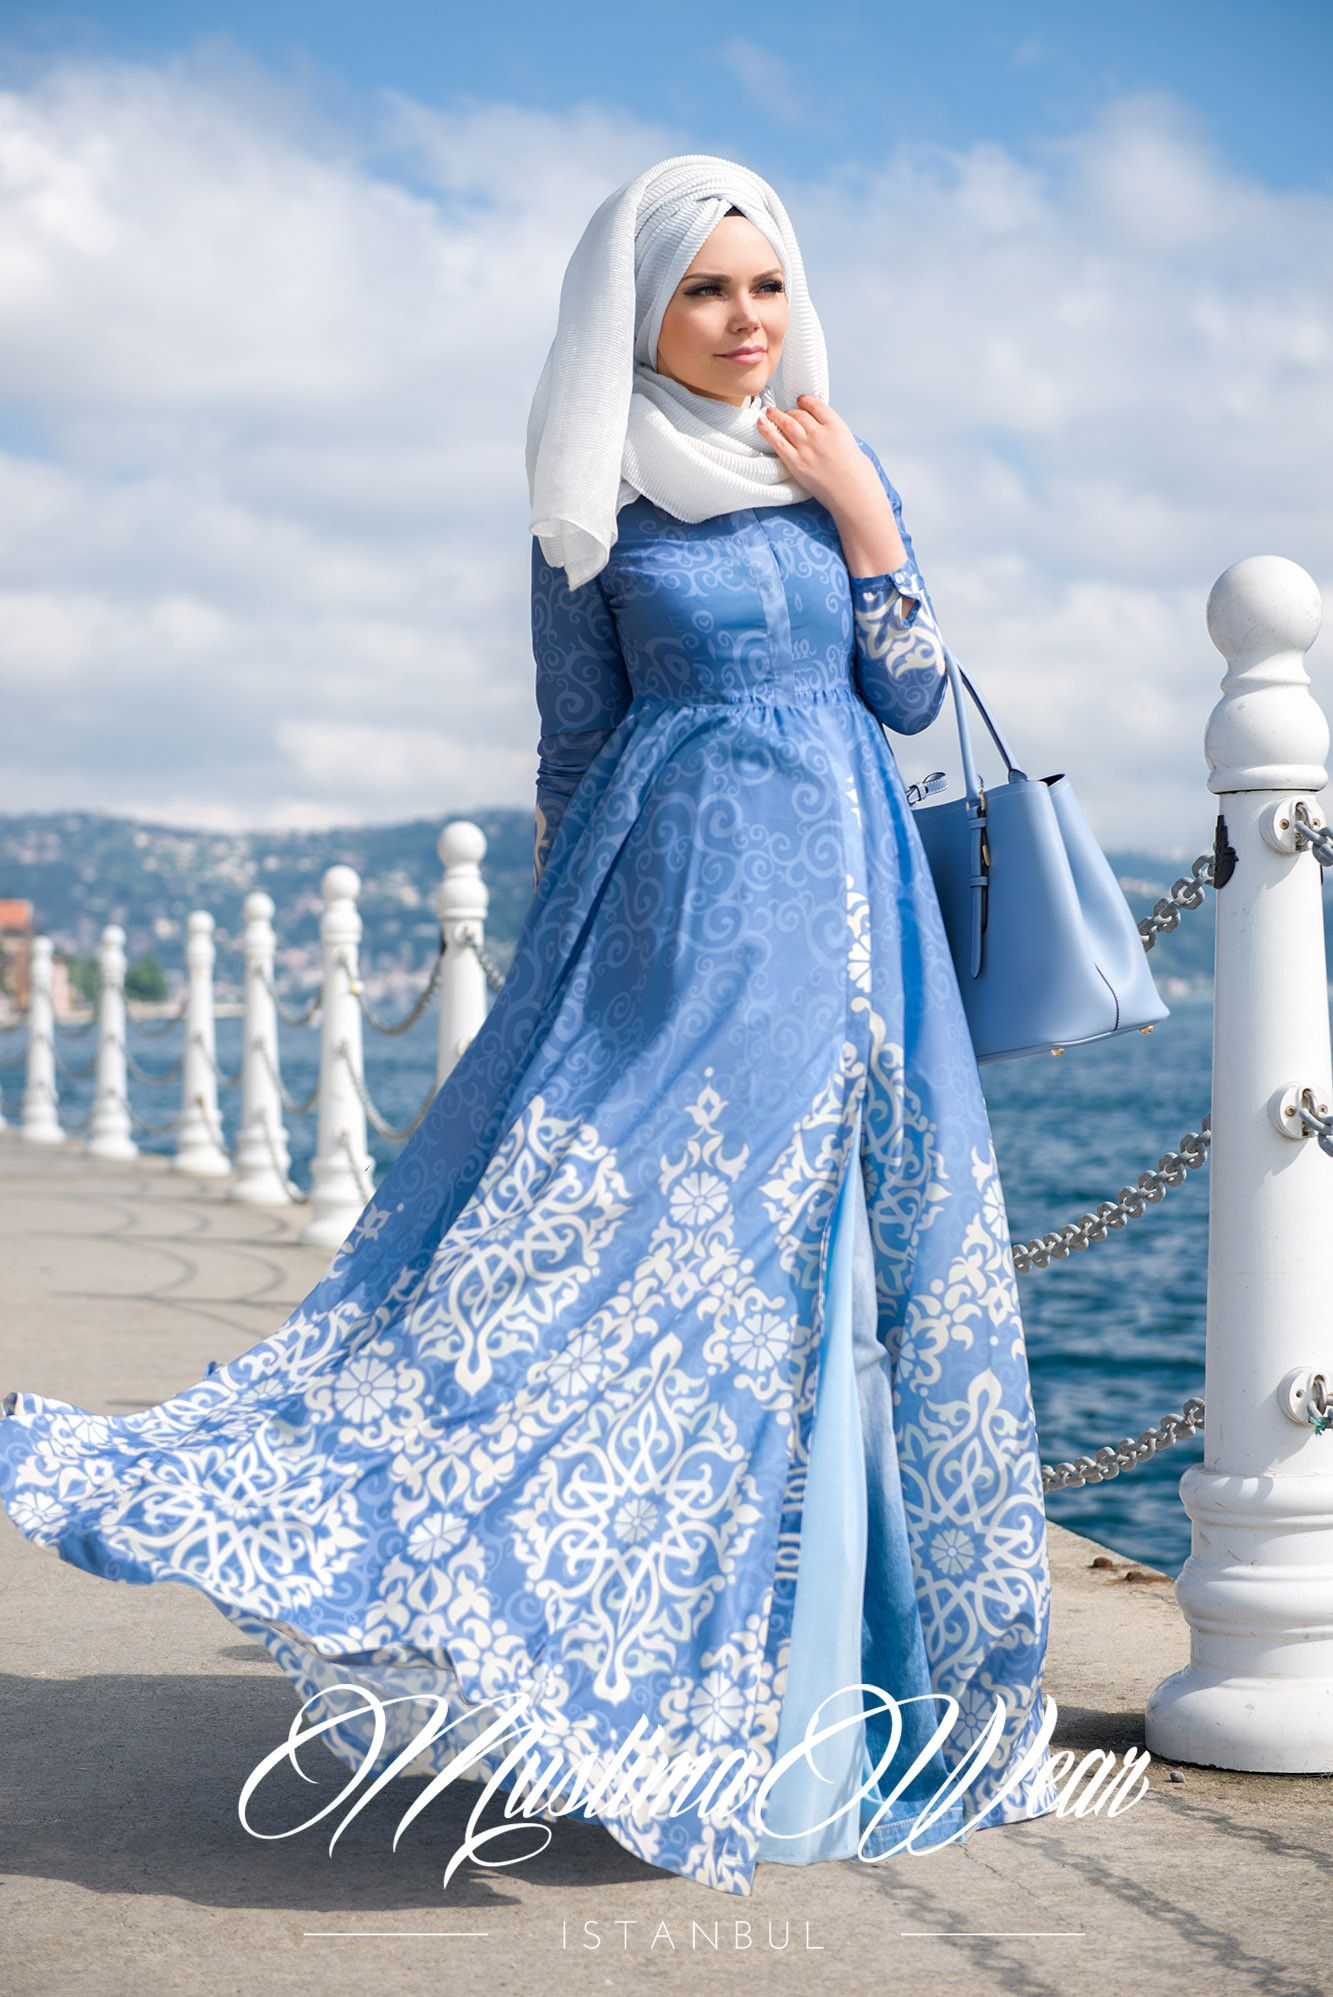 Muslima Wear Dress | Hijab Fashion | Pinterest | Pearls, Collection ...